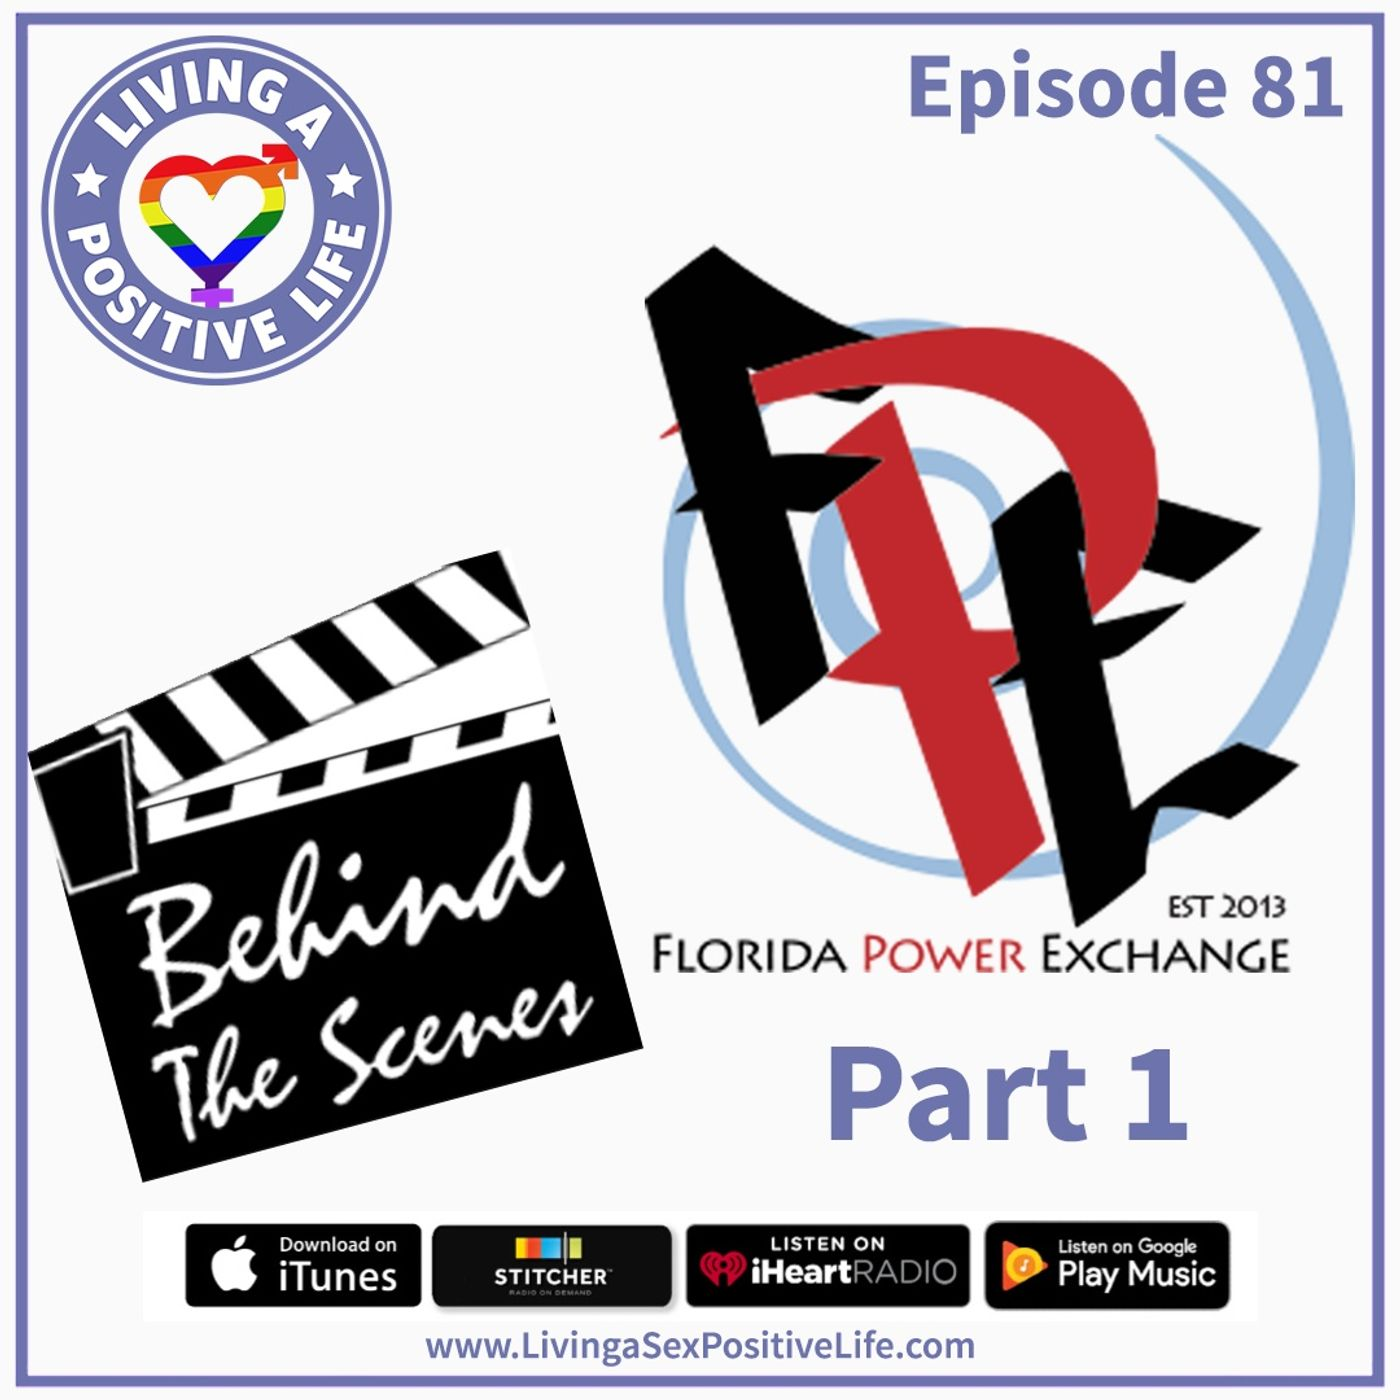 Sex Positive Me - E81: Florida Power Exchange Behind the Scenes Part 1